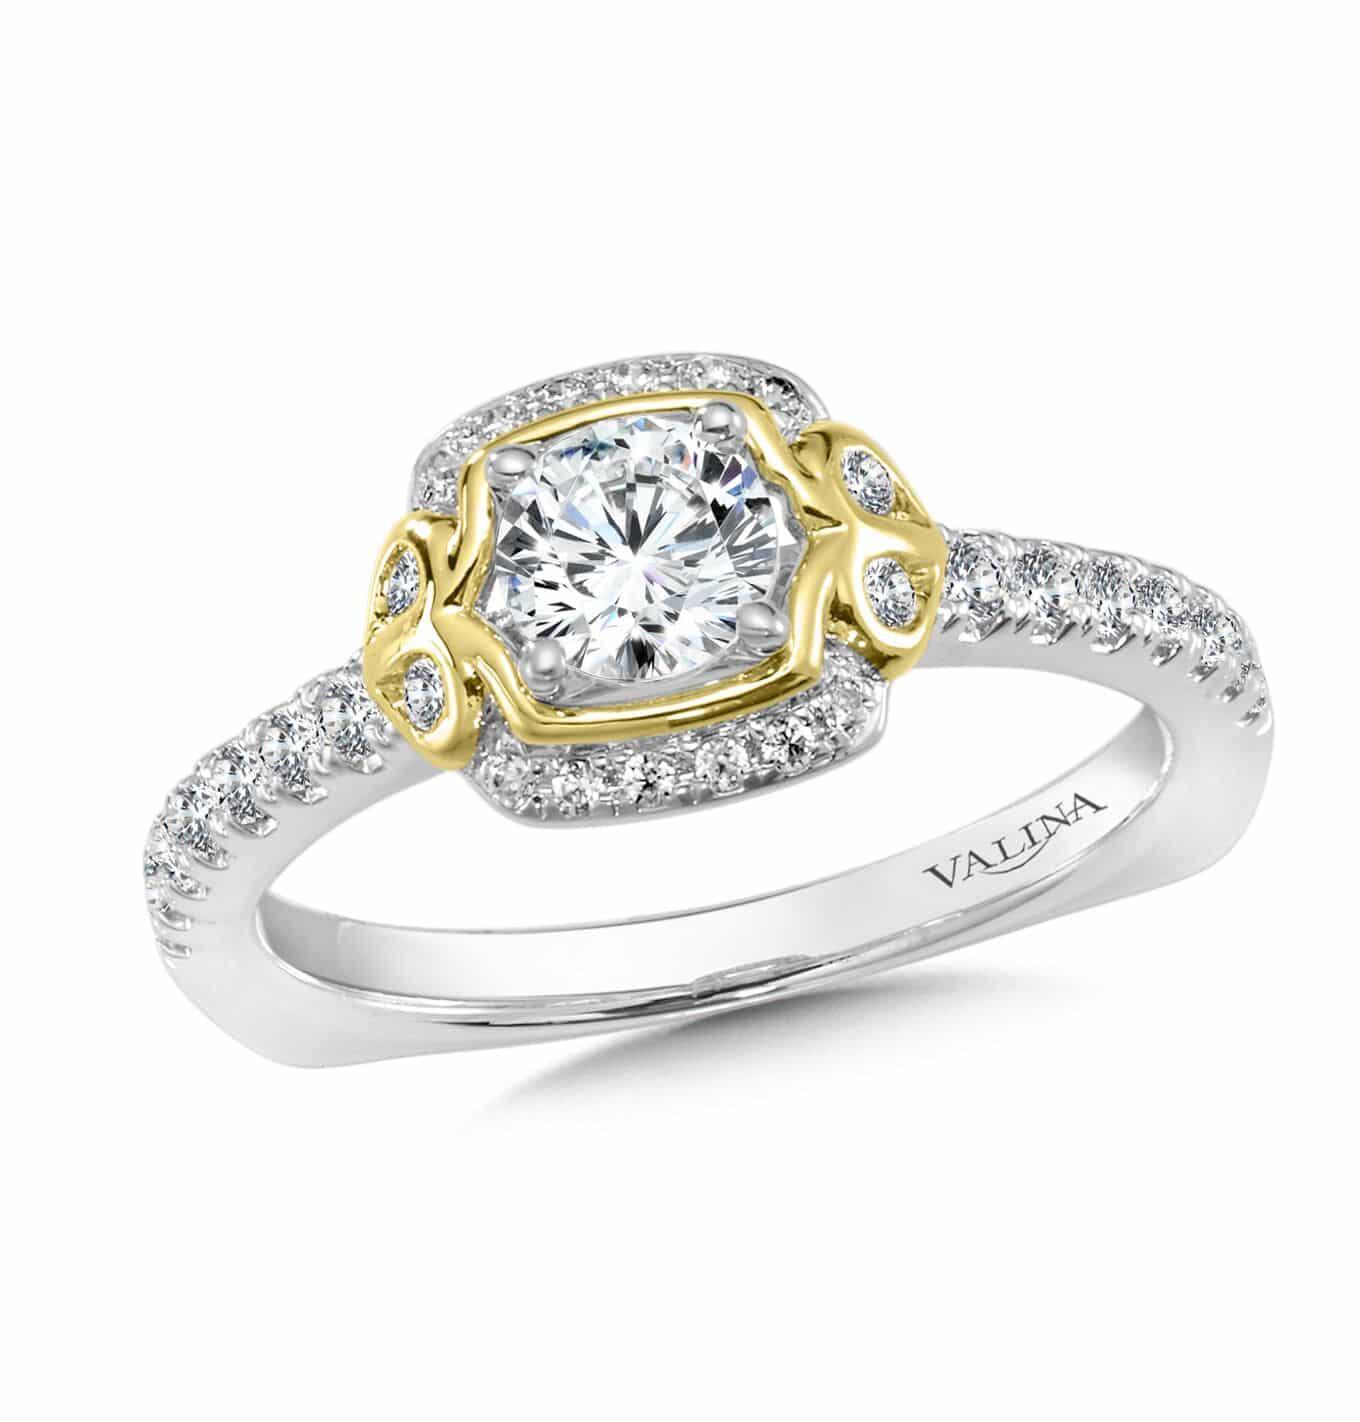 Custom Bezel Round Diamond Engagement Ring with a 1 carat halo - custom design